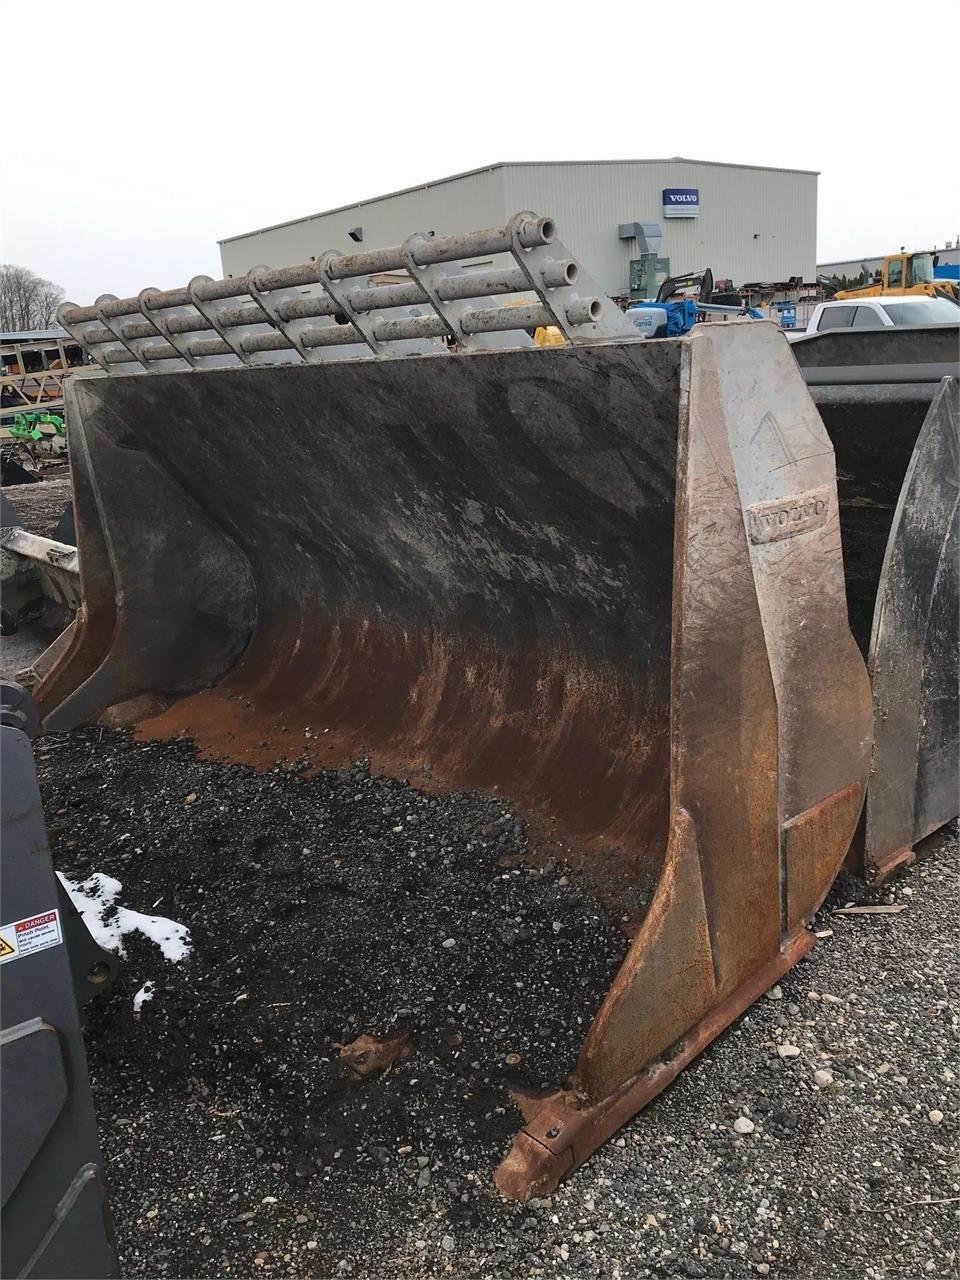 Volvo, Buckets, Construction Equipment